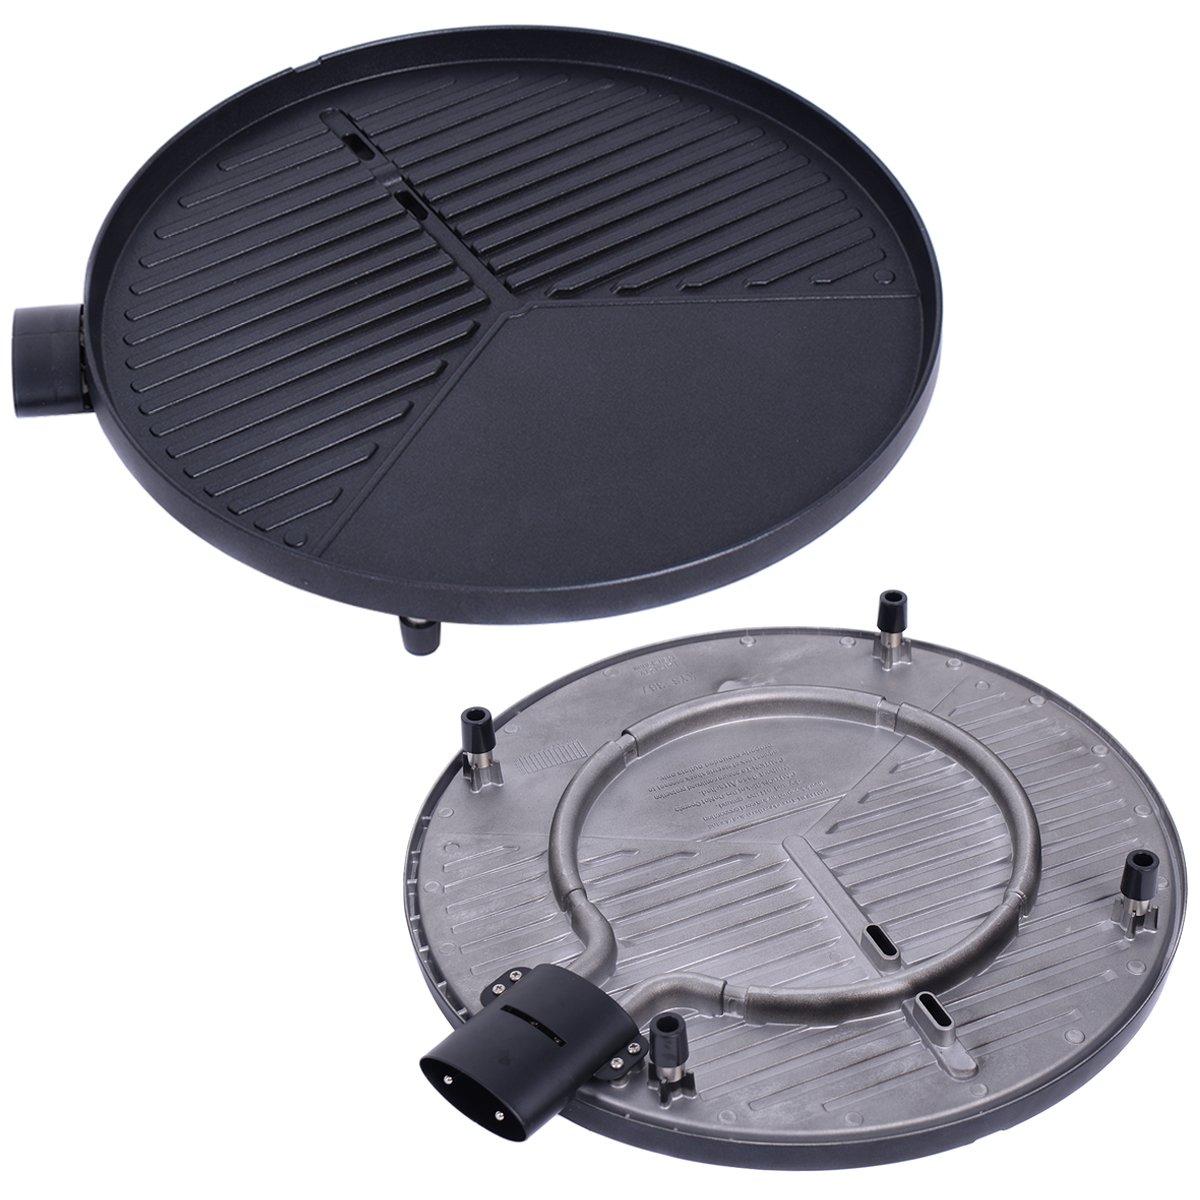 COSTWAY 1350W Indoor/Outdoor Electric BBQ Grill, Black by COSTWAY (Image #6)